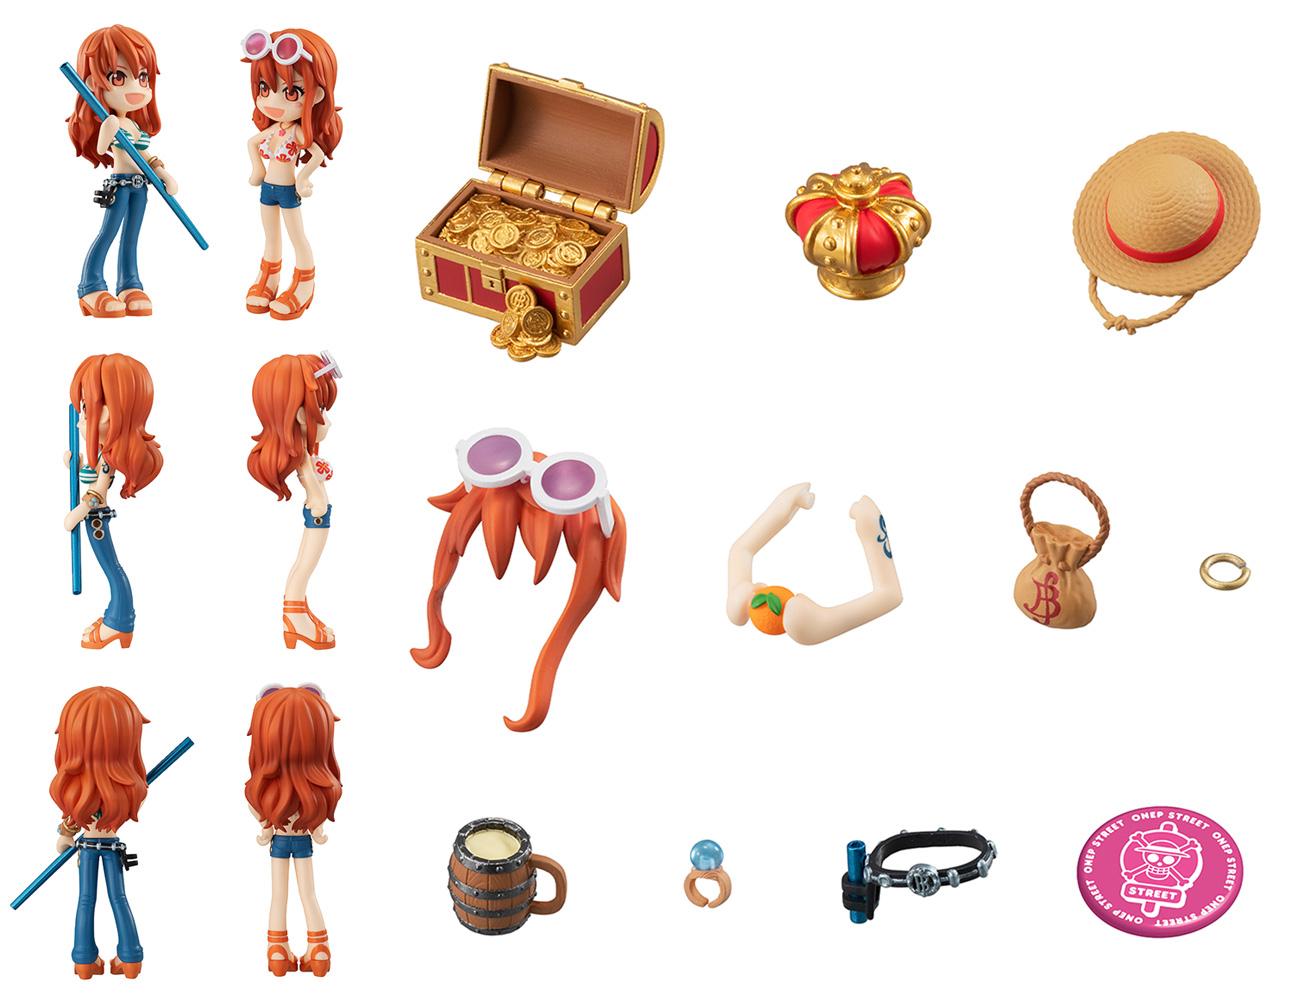 One Piece P O P X PVC Figure: Pinky Street Nami  - Megahouse Corporation